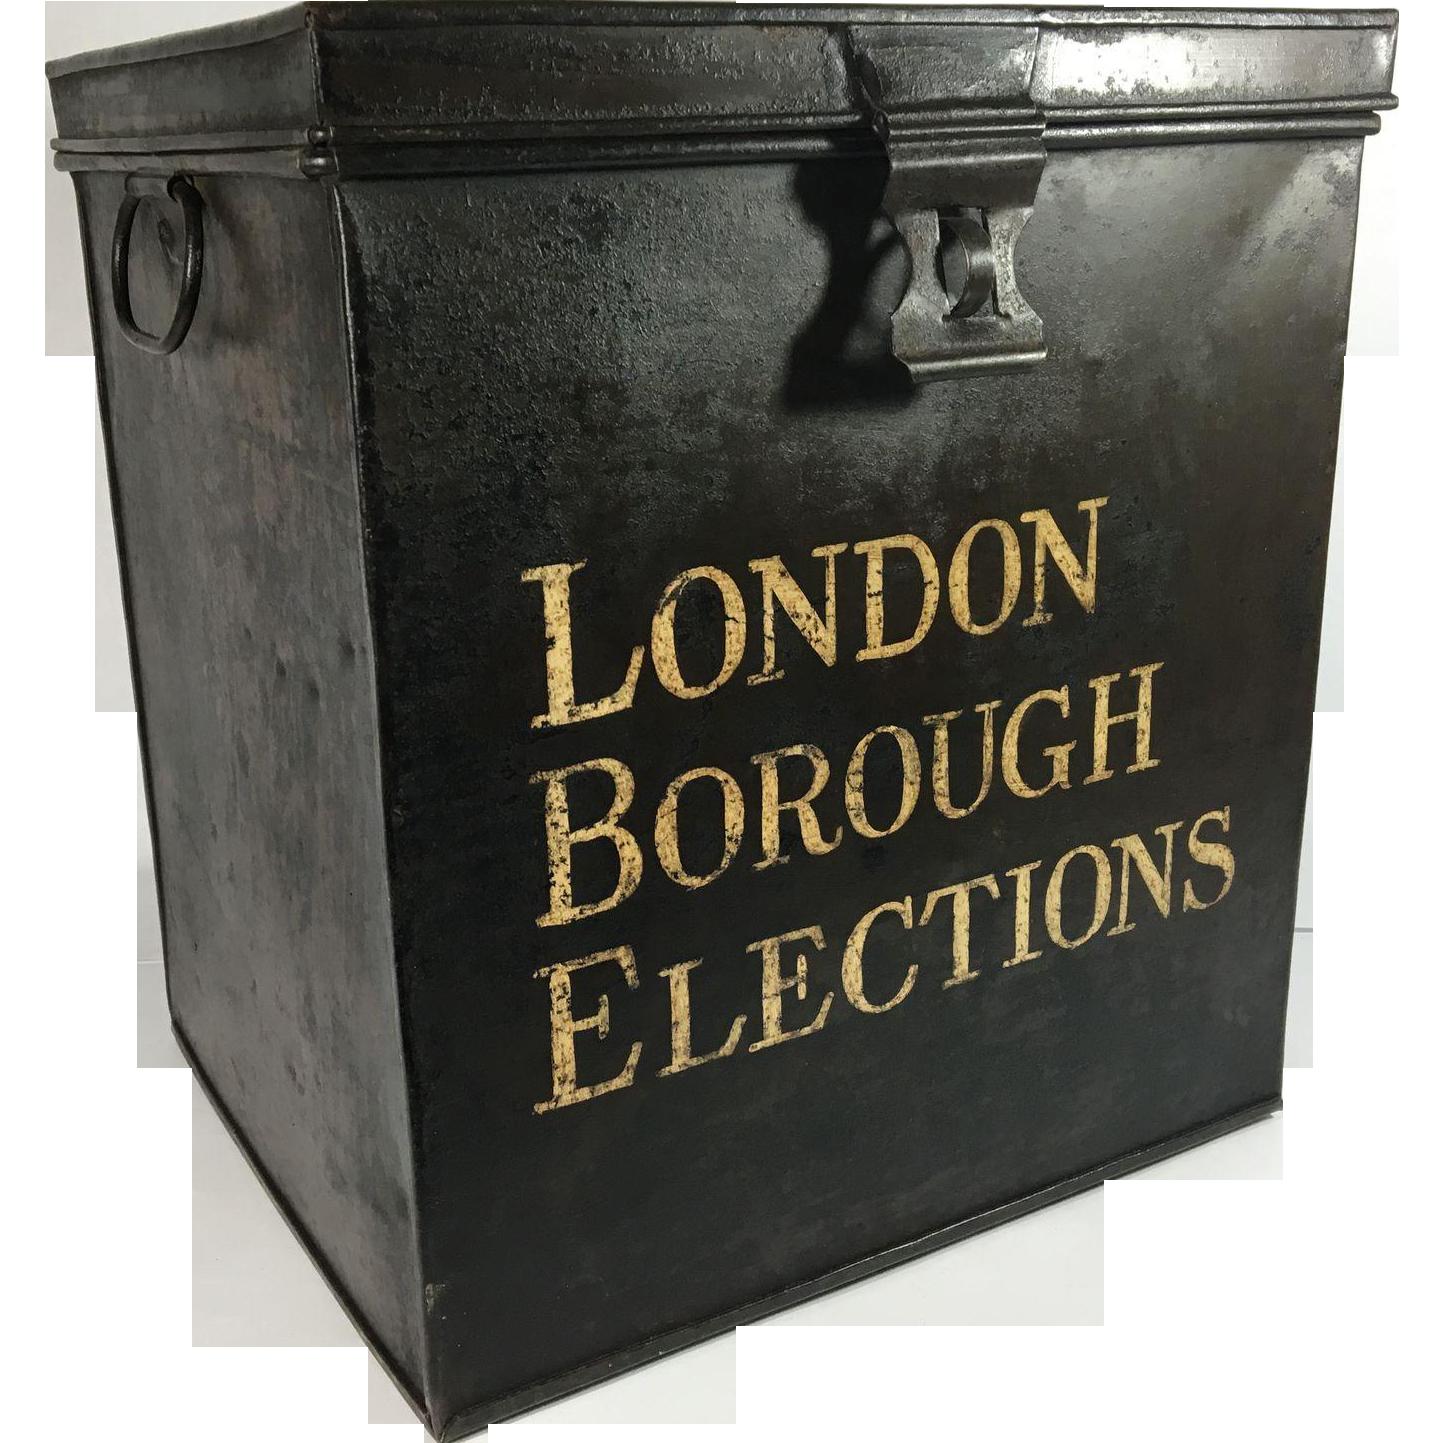 Tole Painted Metal Ballot Box, London Borough Elections